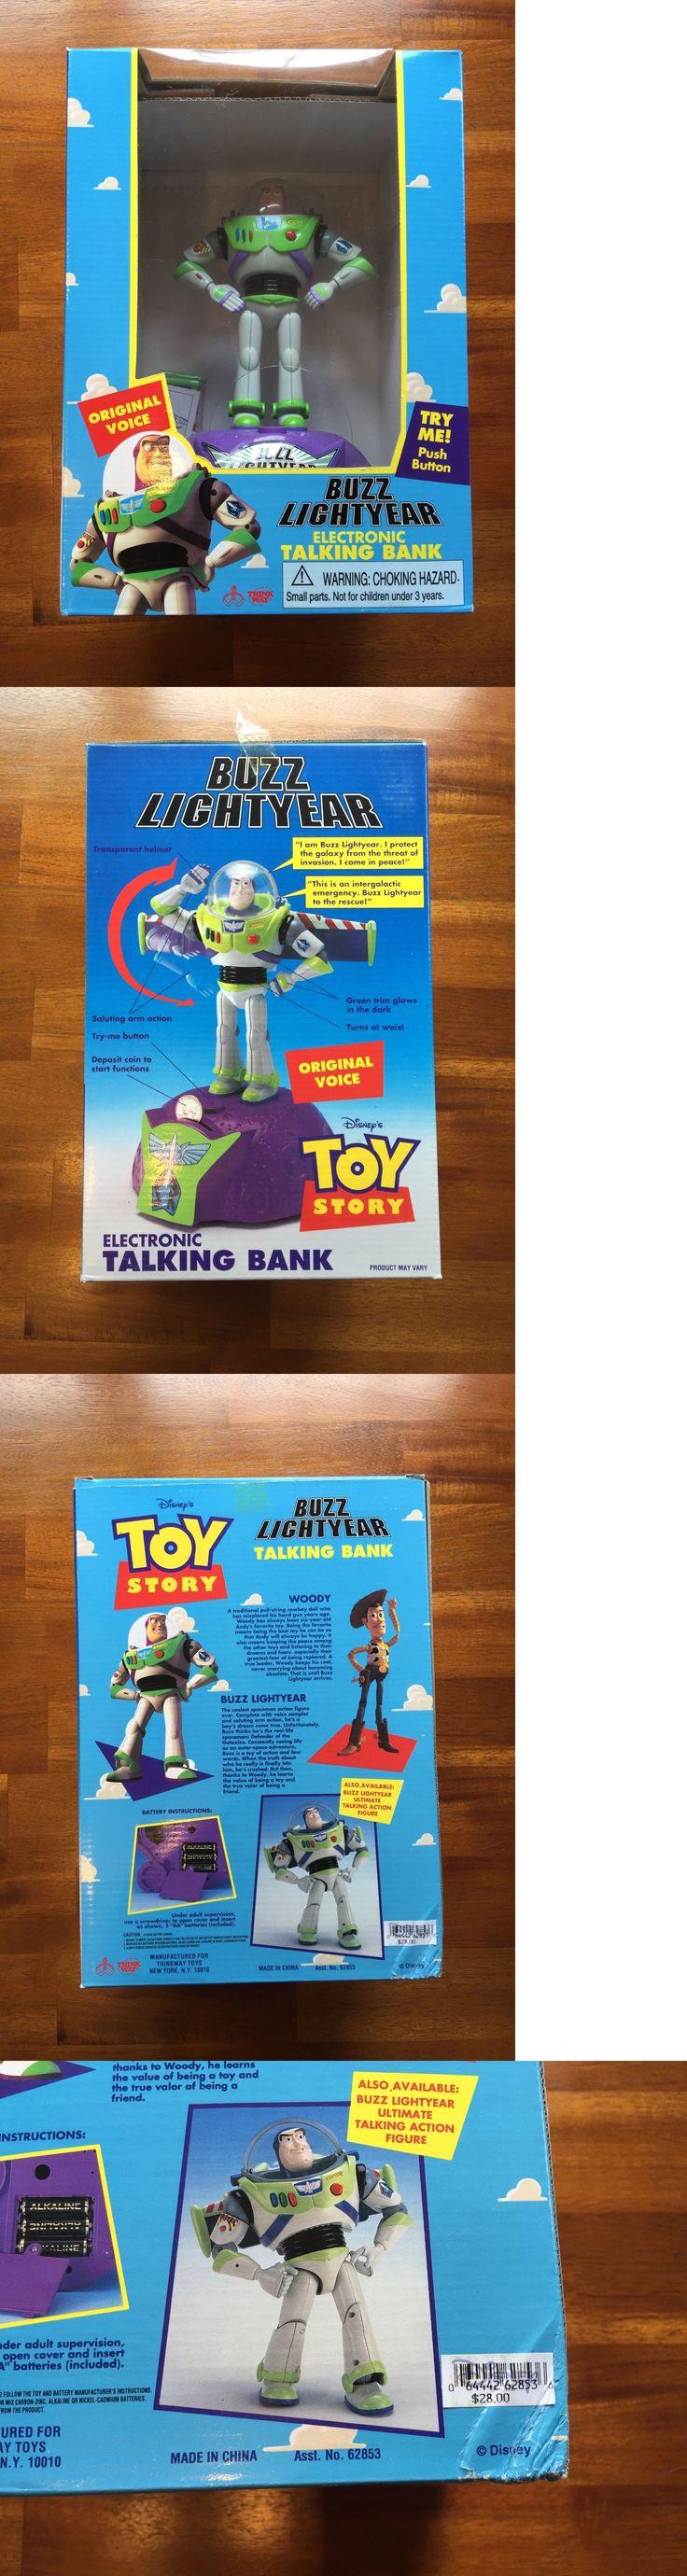 Toy story of terror 1 2 3 buzz lightyear of star command for sale - Toy Story 19223 Rare 1995 Toy Story Buzz Lightyear Electronic Talking Bank Nib Think Way